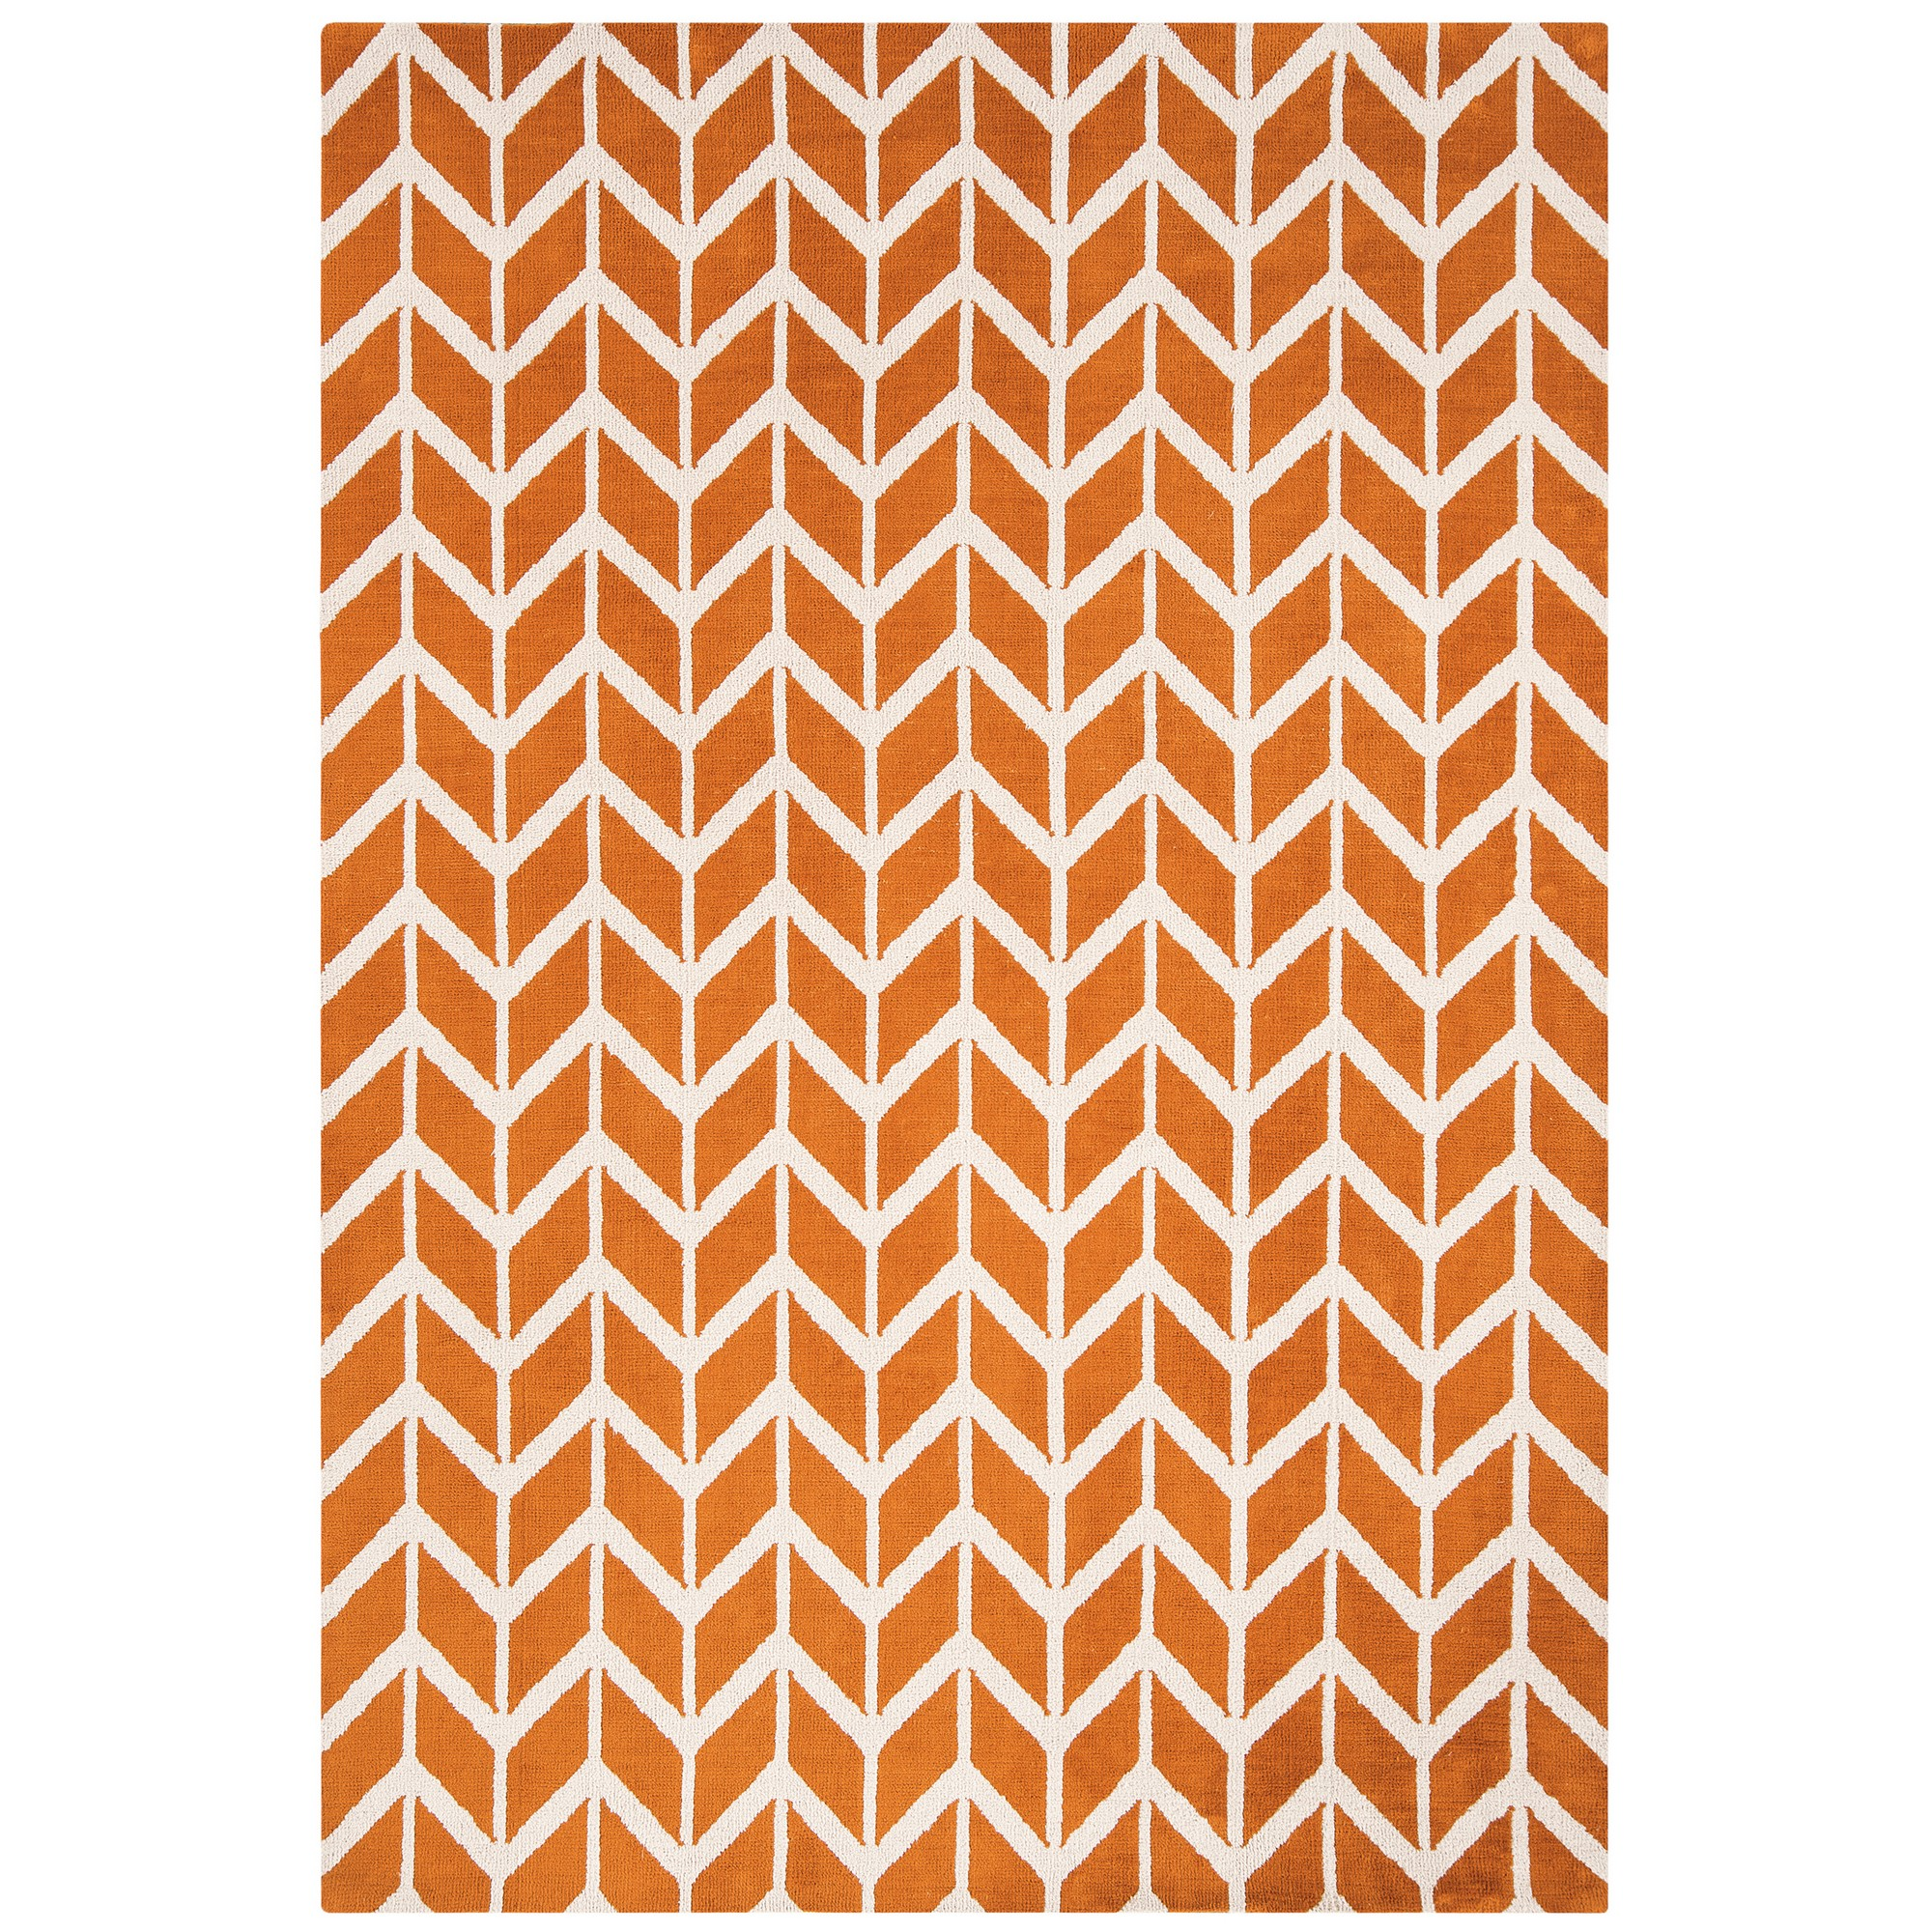 arlo chevron rugs ar in orange  free uk delivery  the rug seller - arlo chevron rugs ar in orange